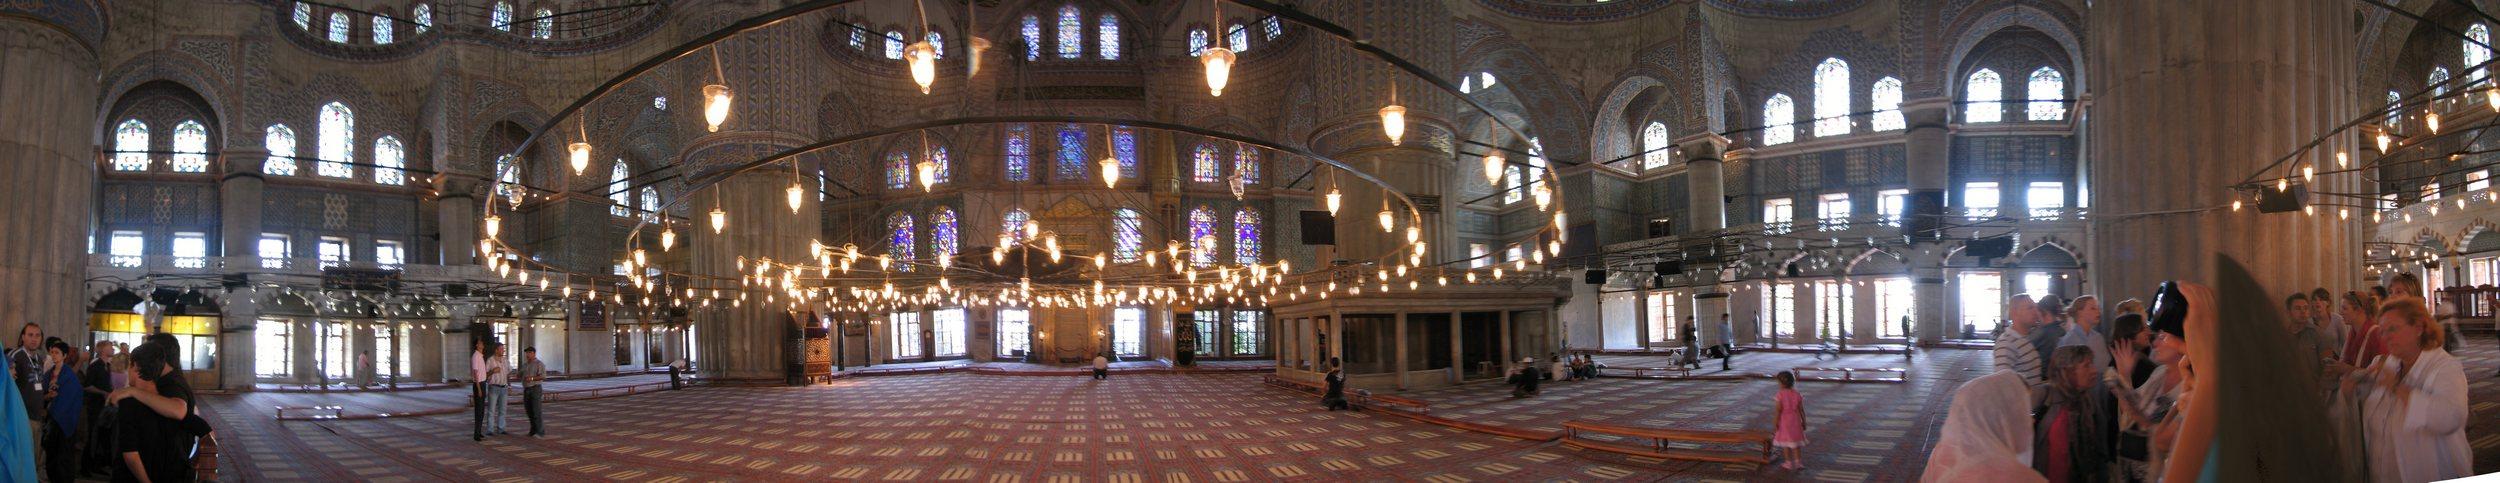 Blue_mosque_interior_panorama.jpg (2500×483)